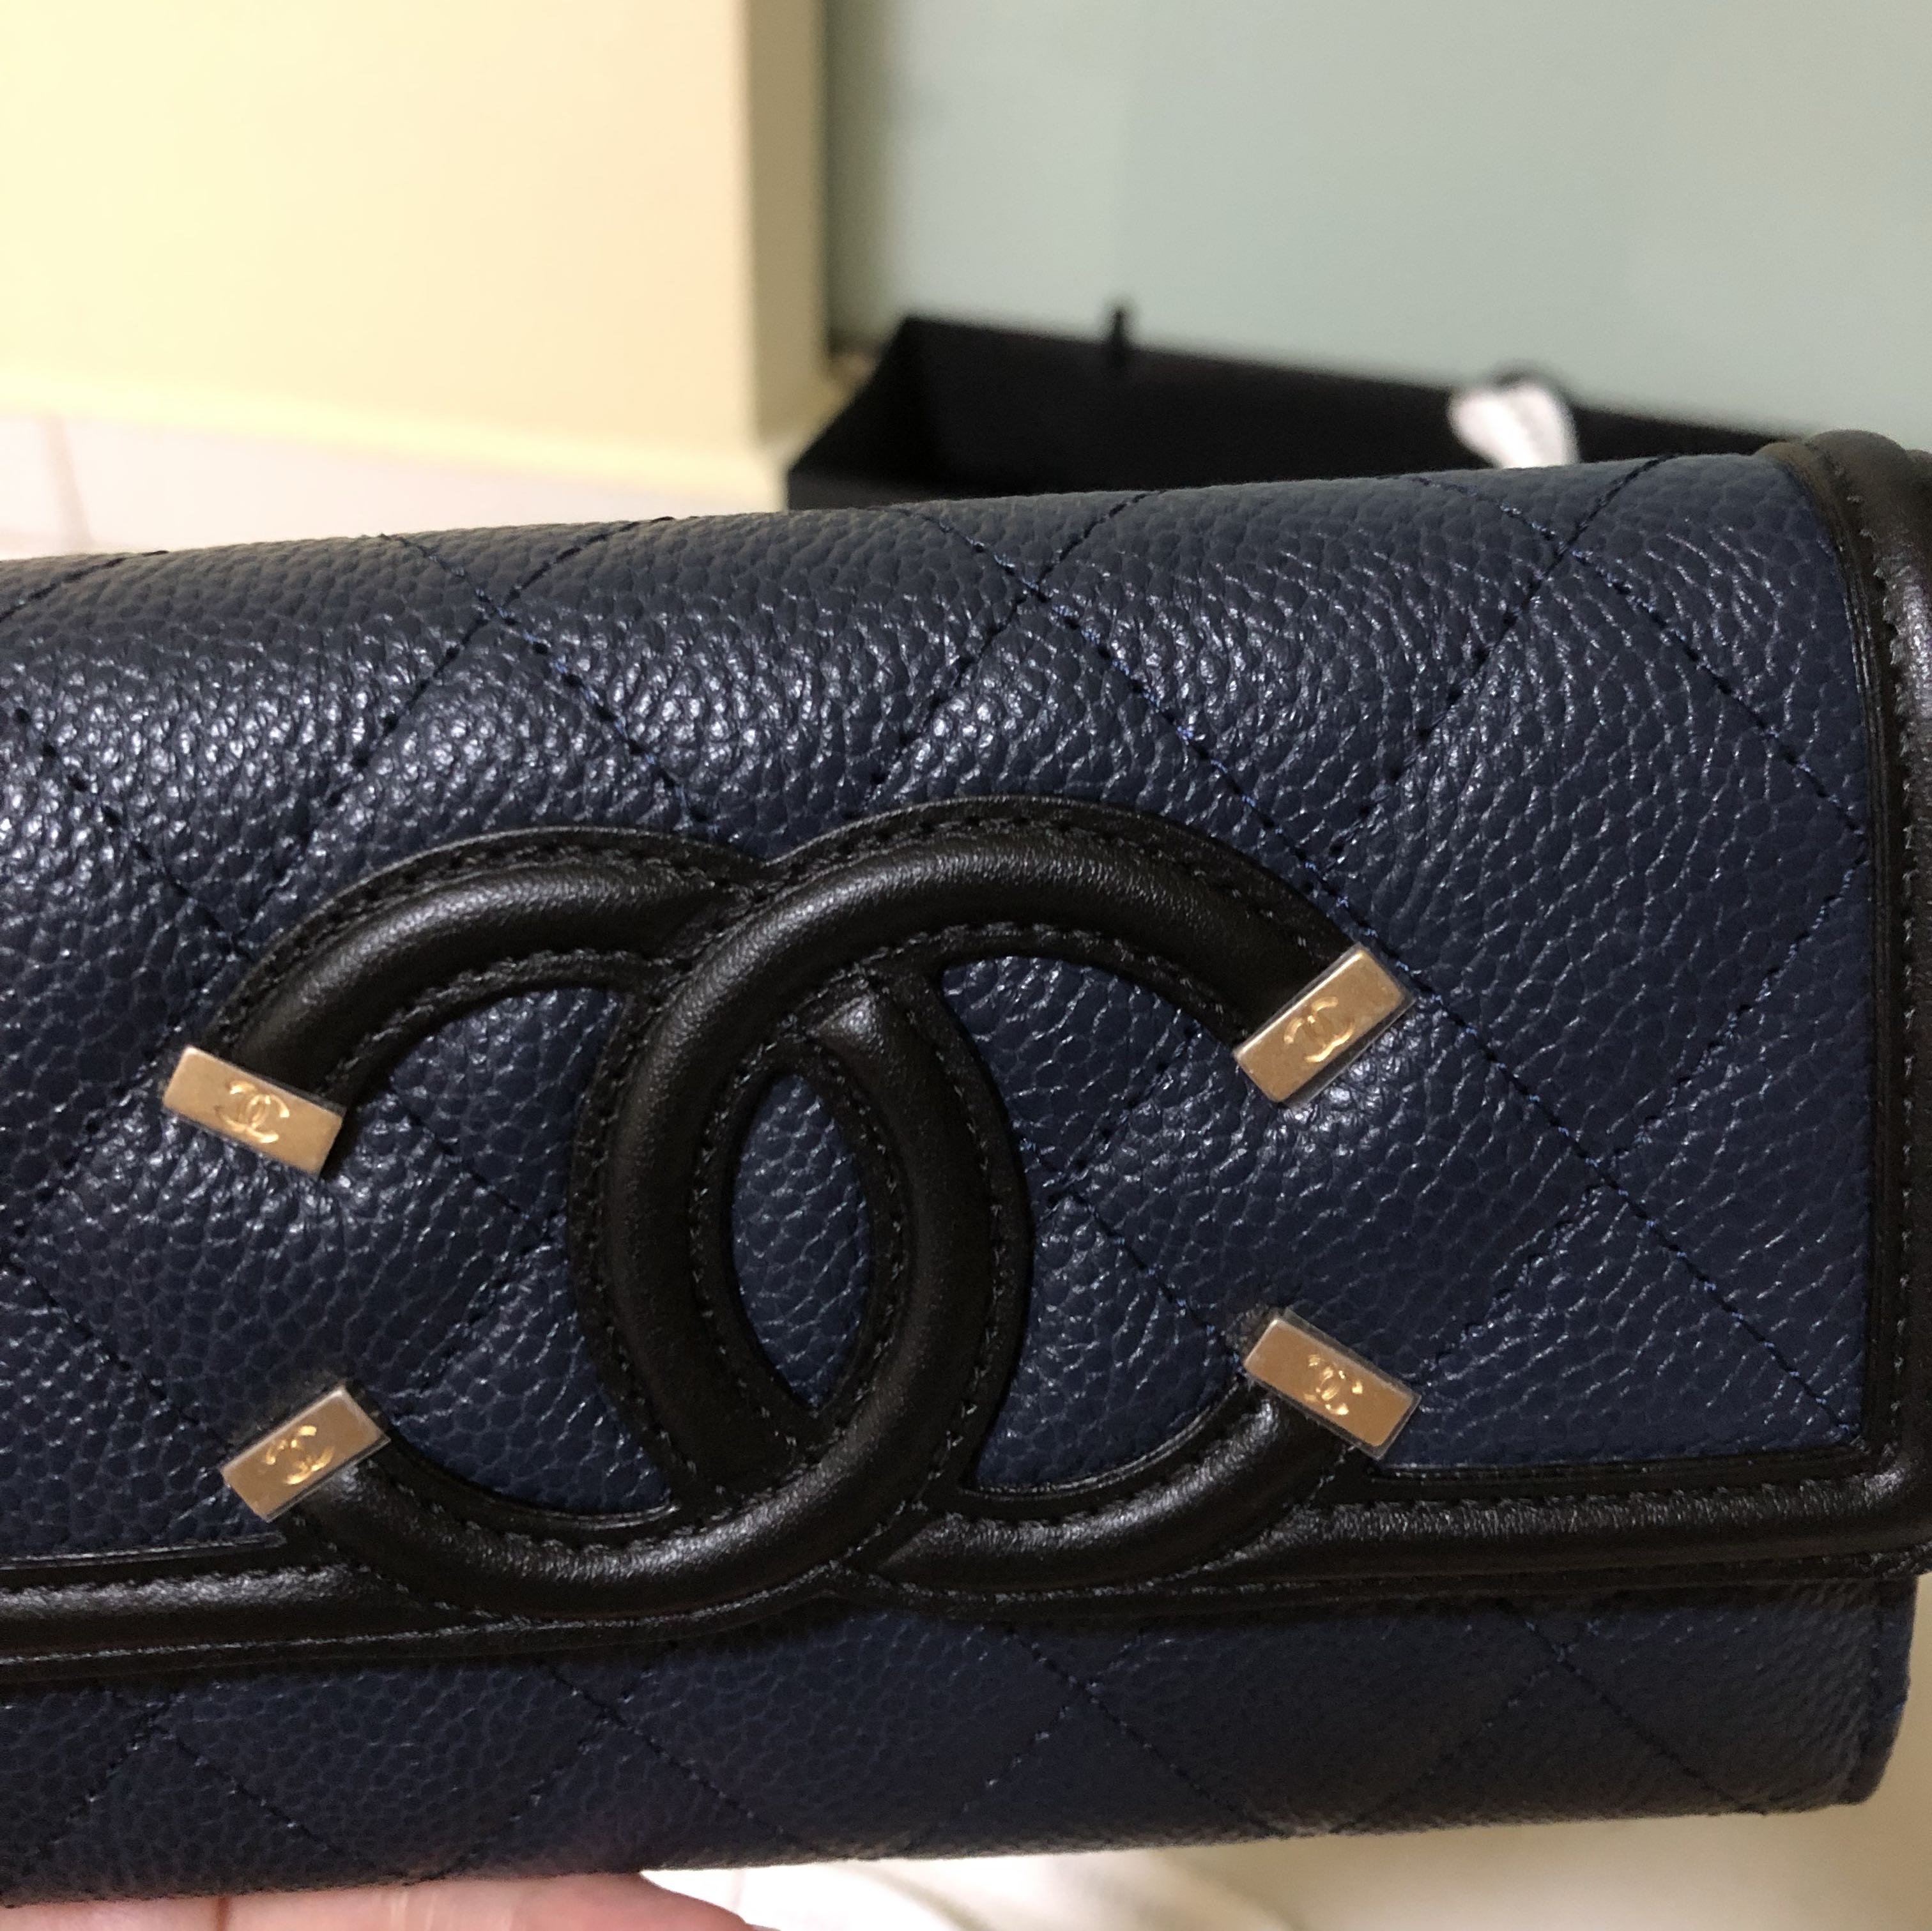 1a273fcdba65 Chanel Vanity Medium wallet - 2 tone. Rare, Luxury, Bags & Wallets ...